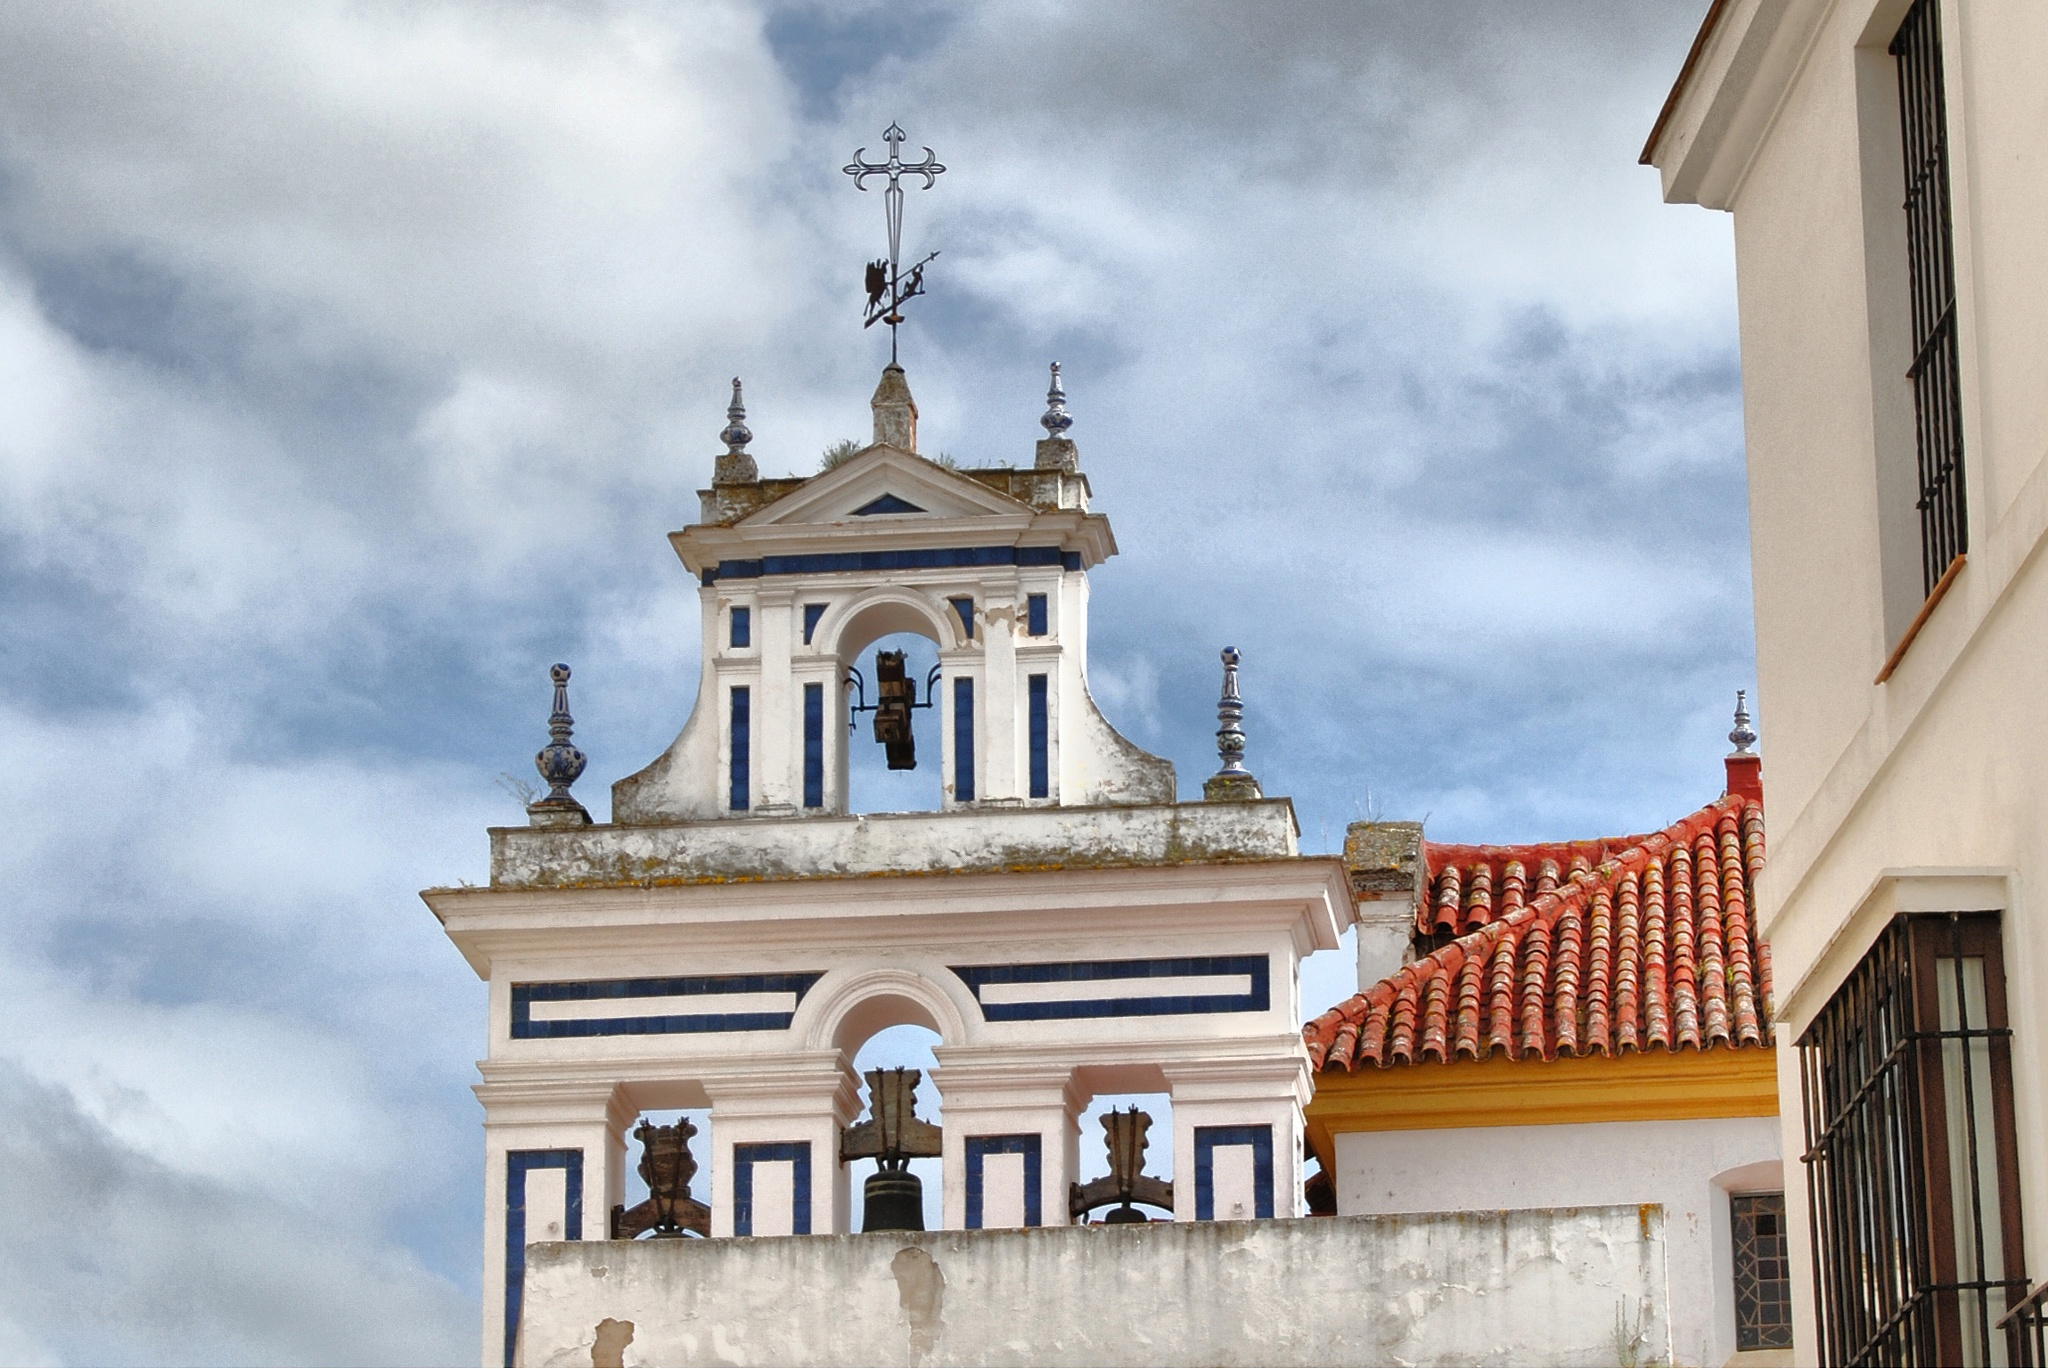 Belfry of Santiago Church by DavidRoldan